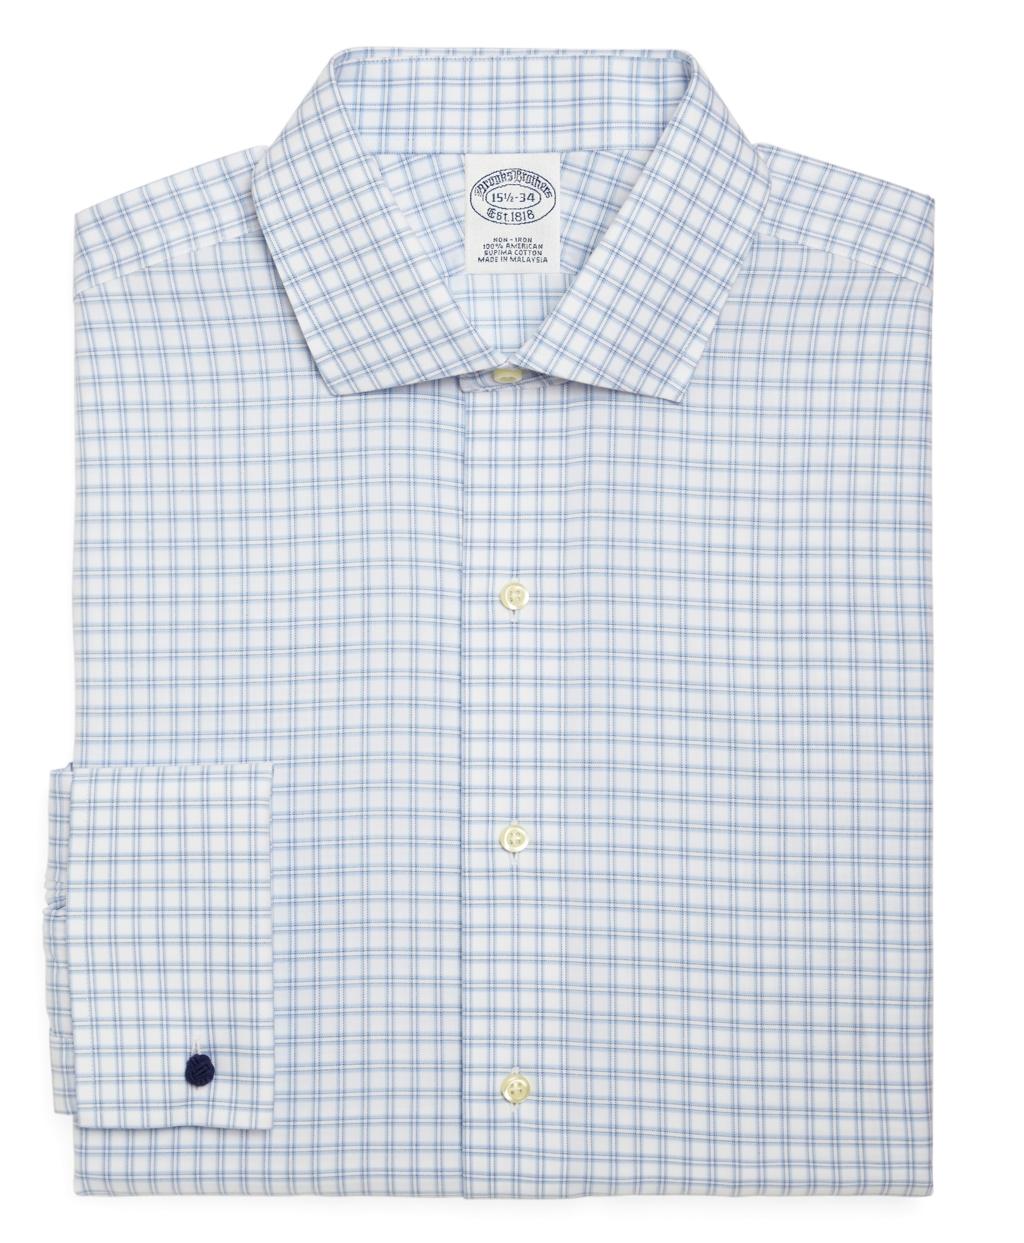 Lyst brooks brothers supima cotton non iron regular fit for Supima cotton dress shirts